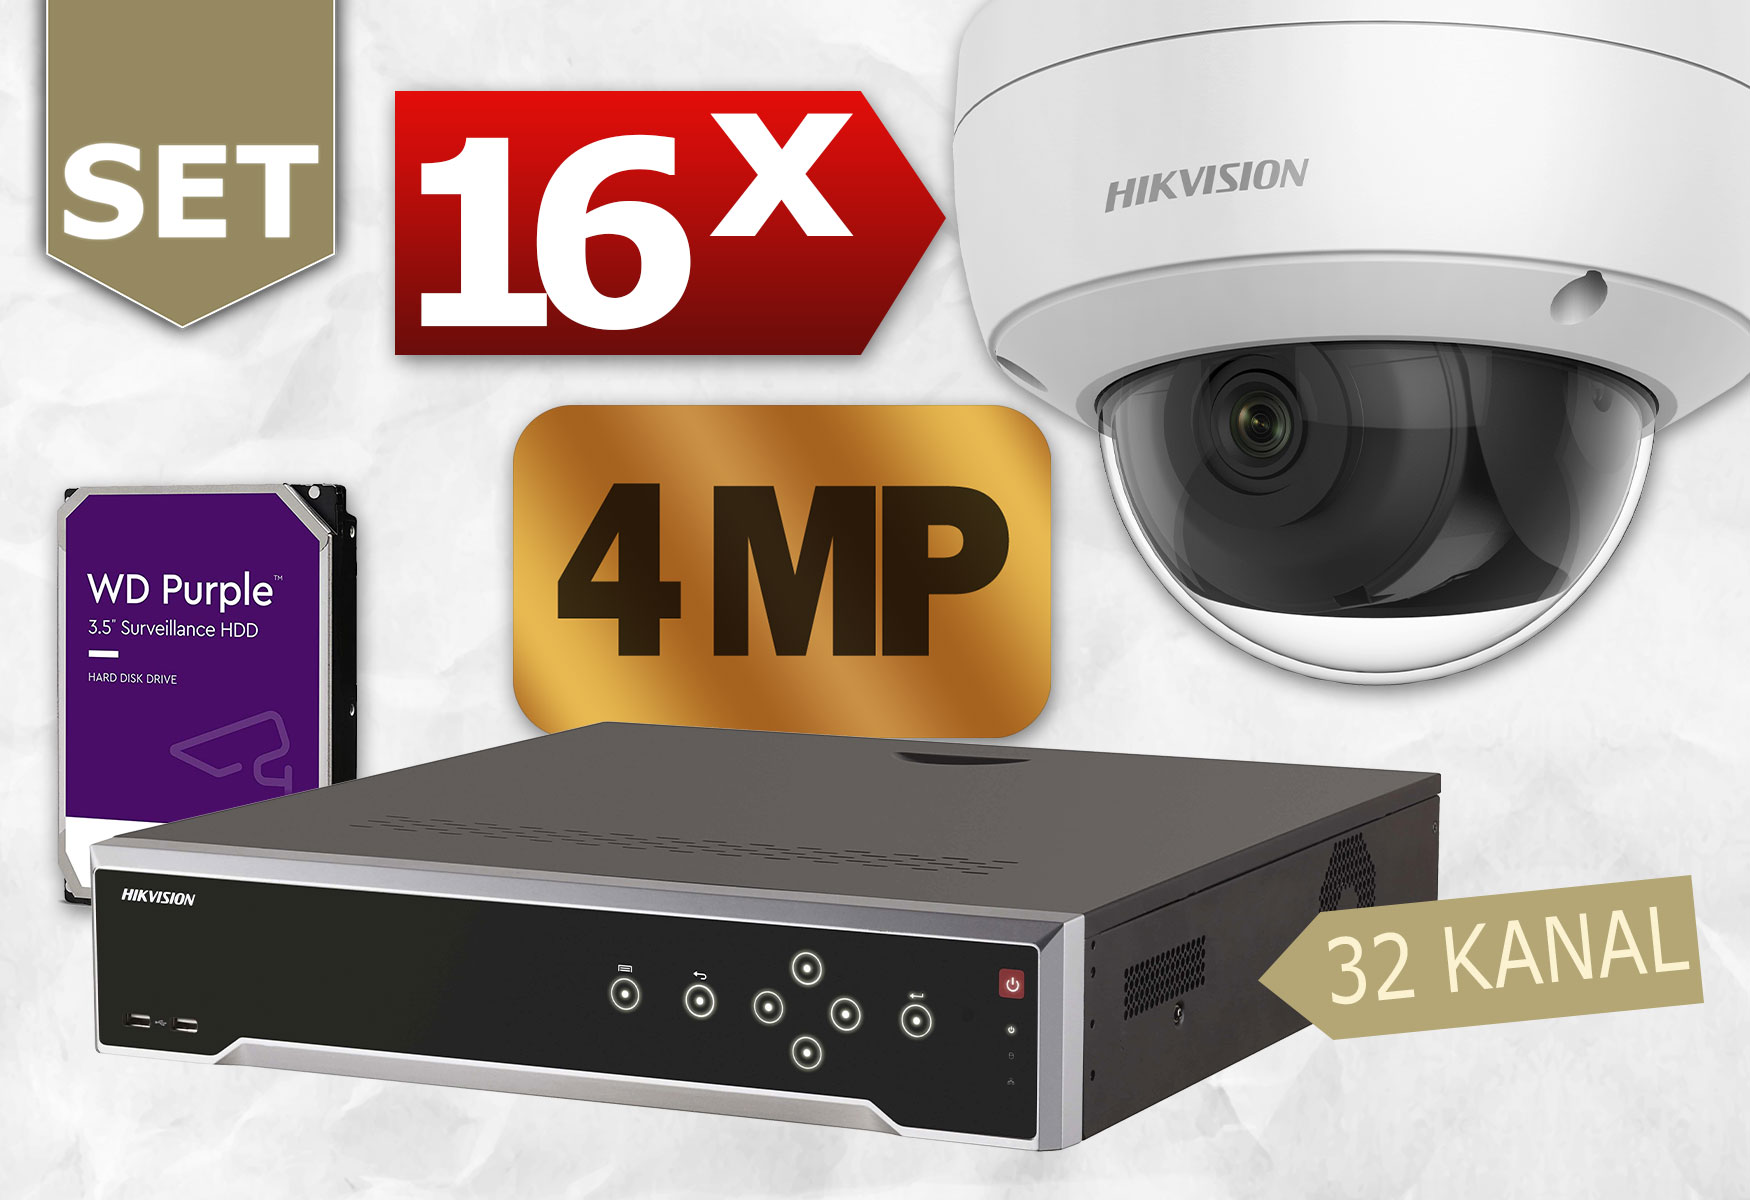 Dome-16x-4MP-32-Kanal-Netzwerkgeraet-ueberwachungskamera_set_nvr_ip_kamera-GekkoStuff_2.jpg